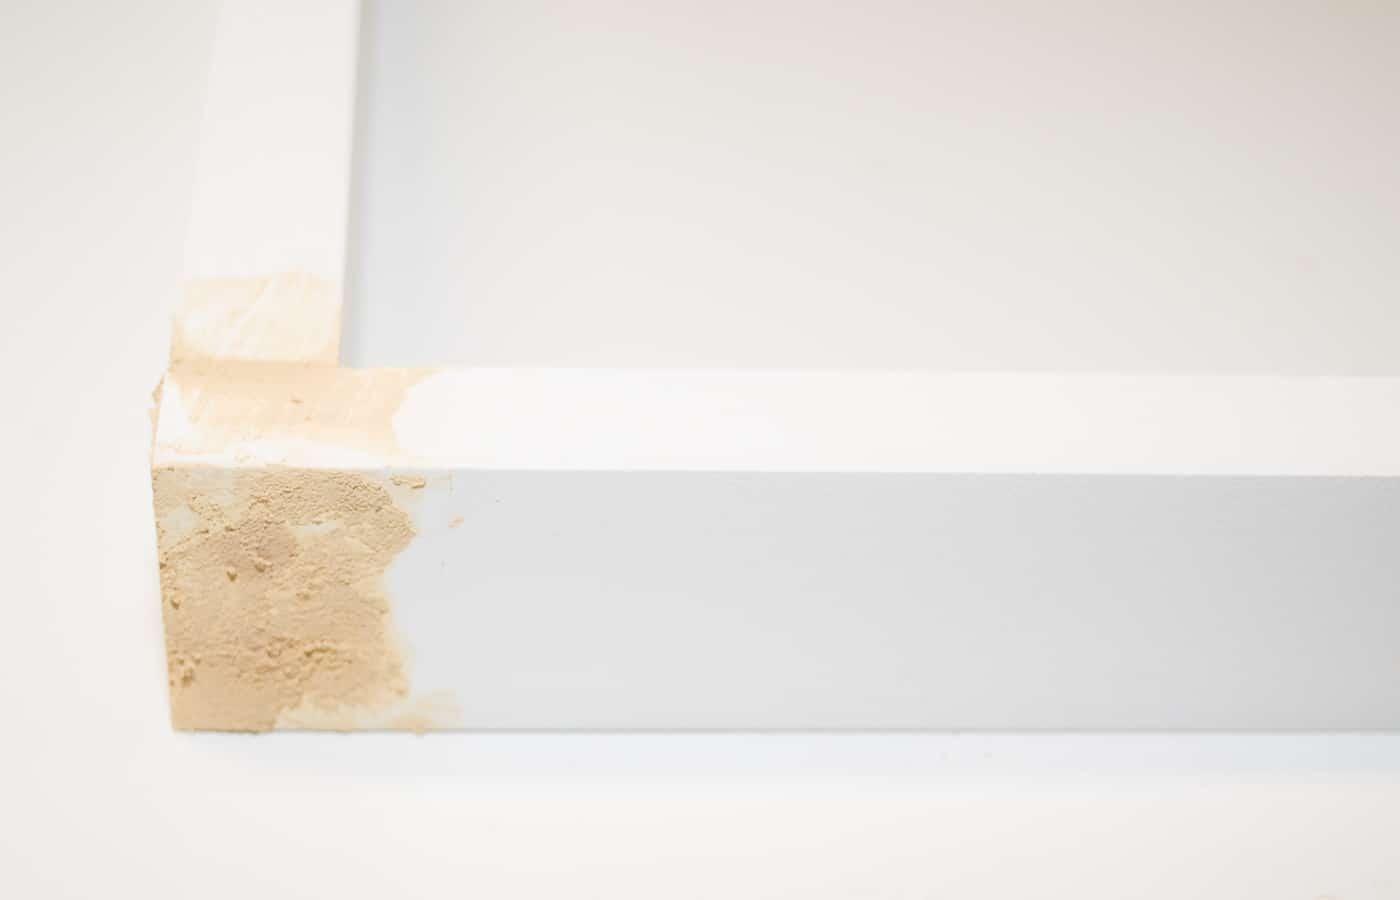 wood filler covering up screws in end of poster frame corners